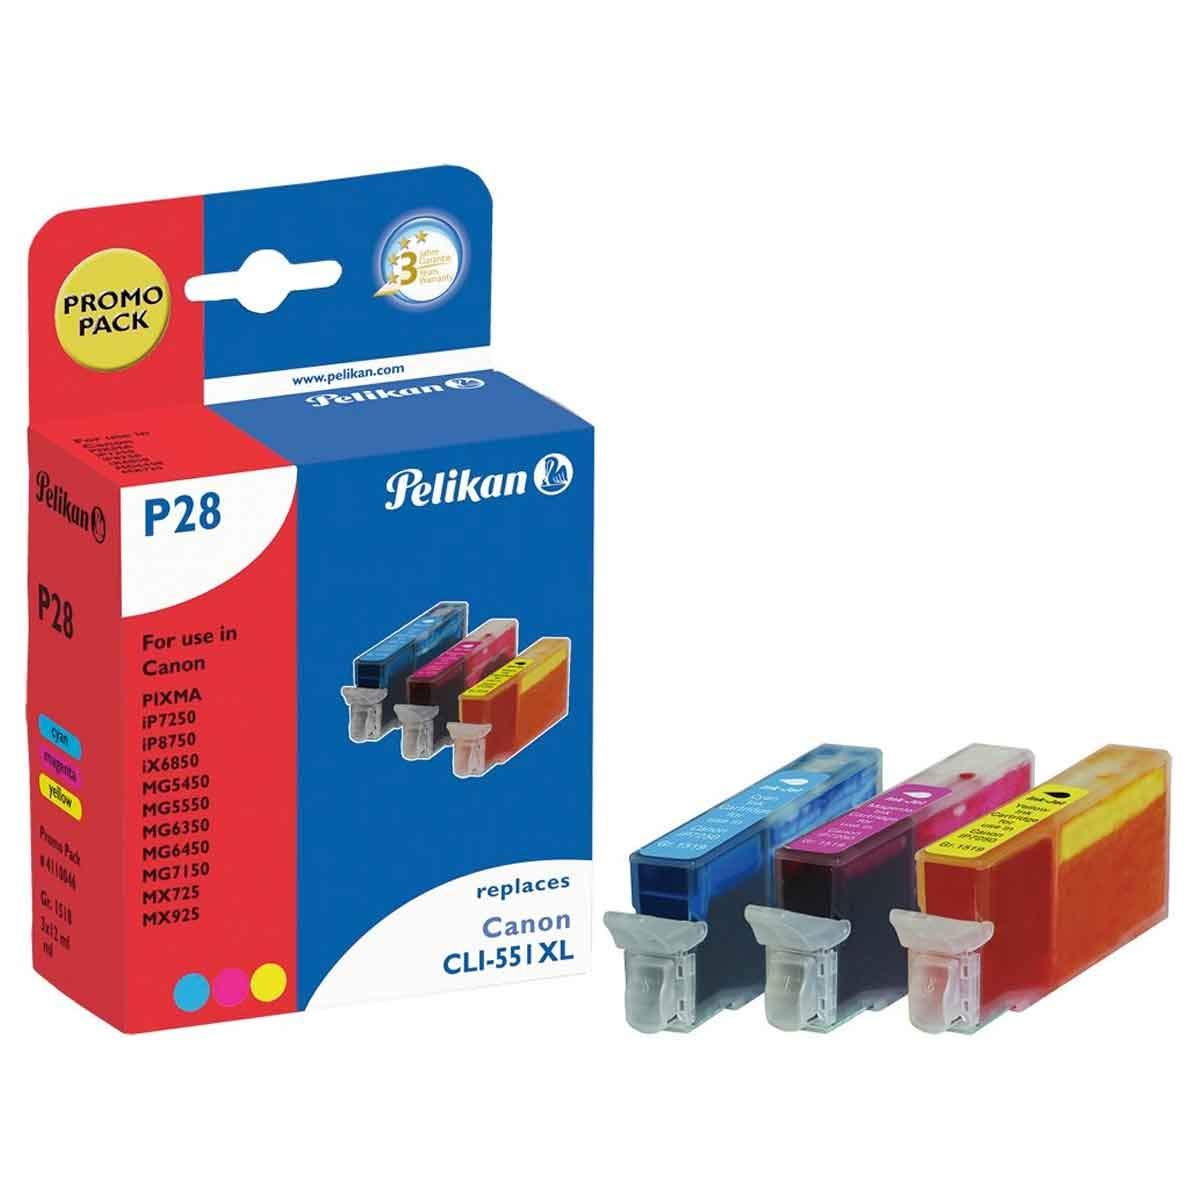 Pelikan P28 CMY cartucho de tinta Cian, Magenta, Amarillo 12 ml ...